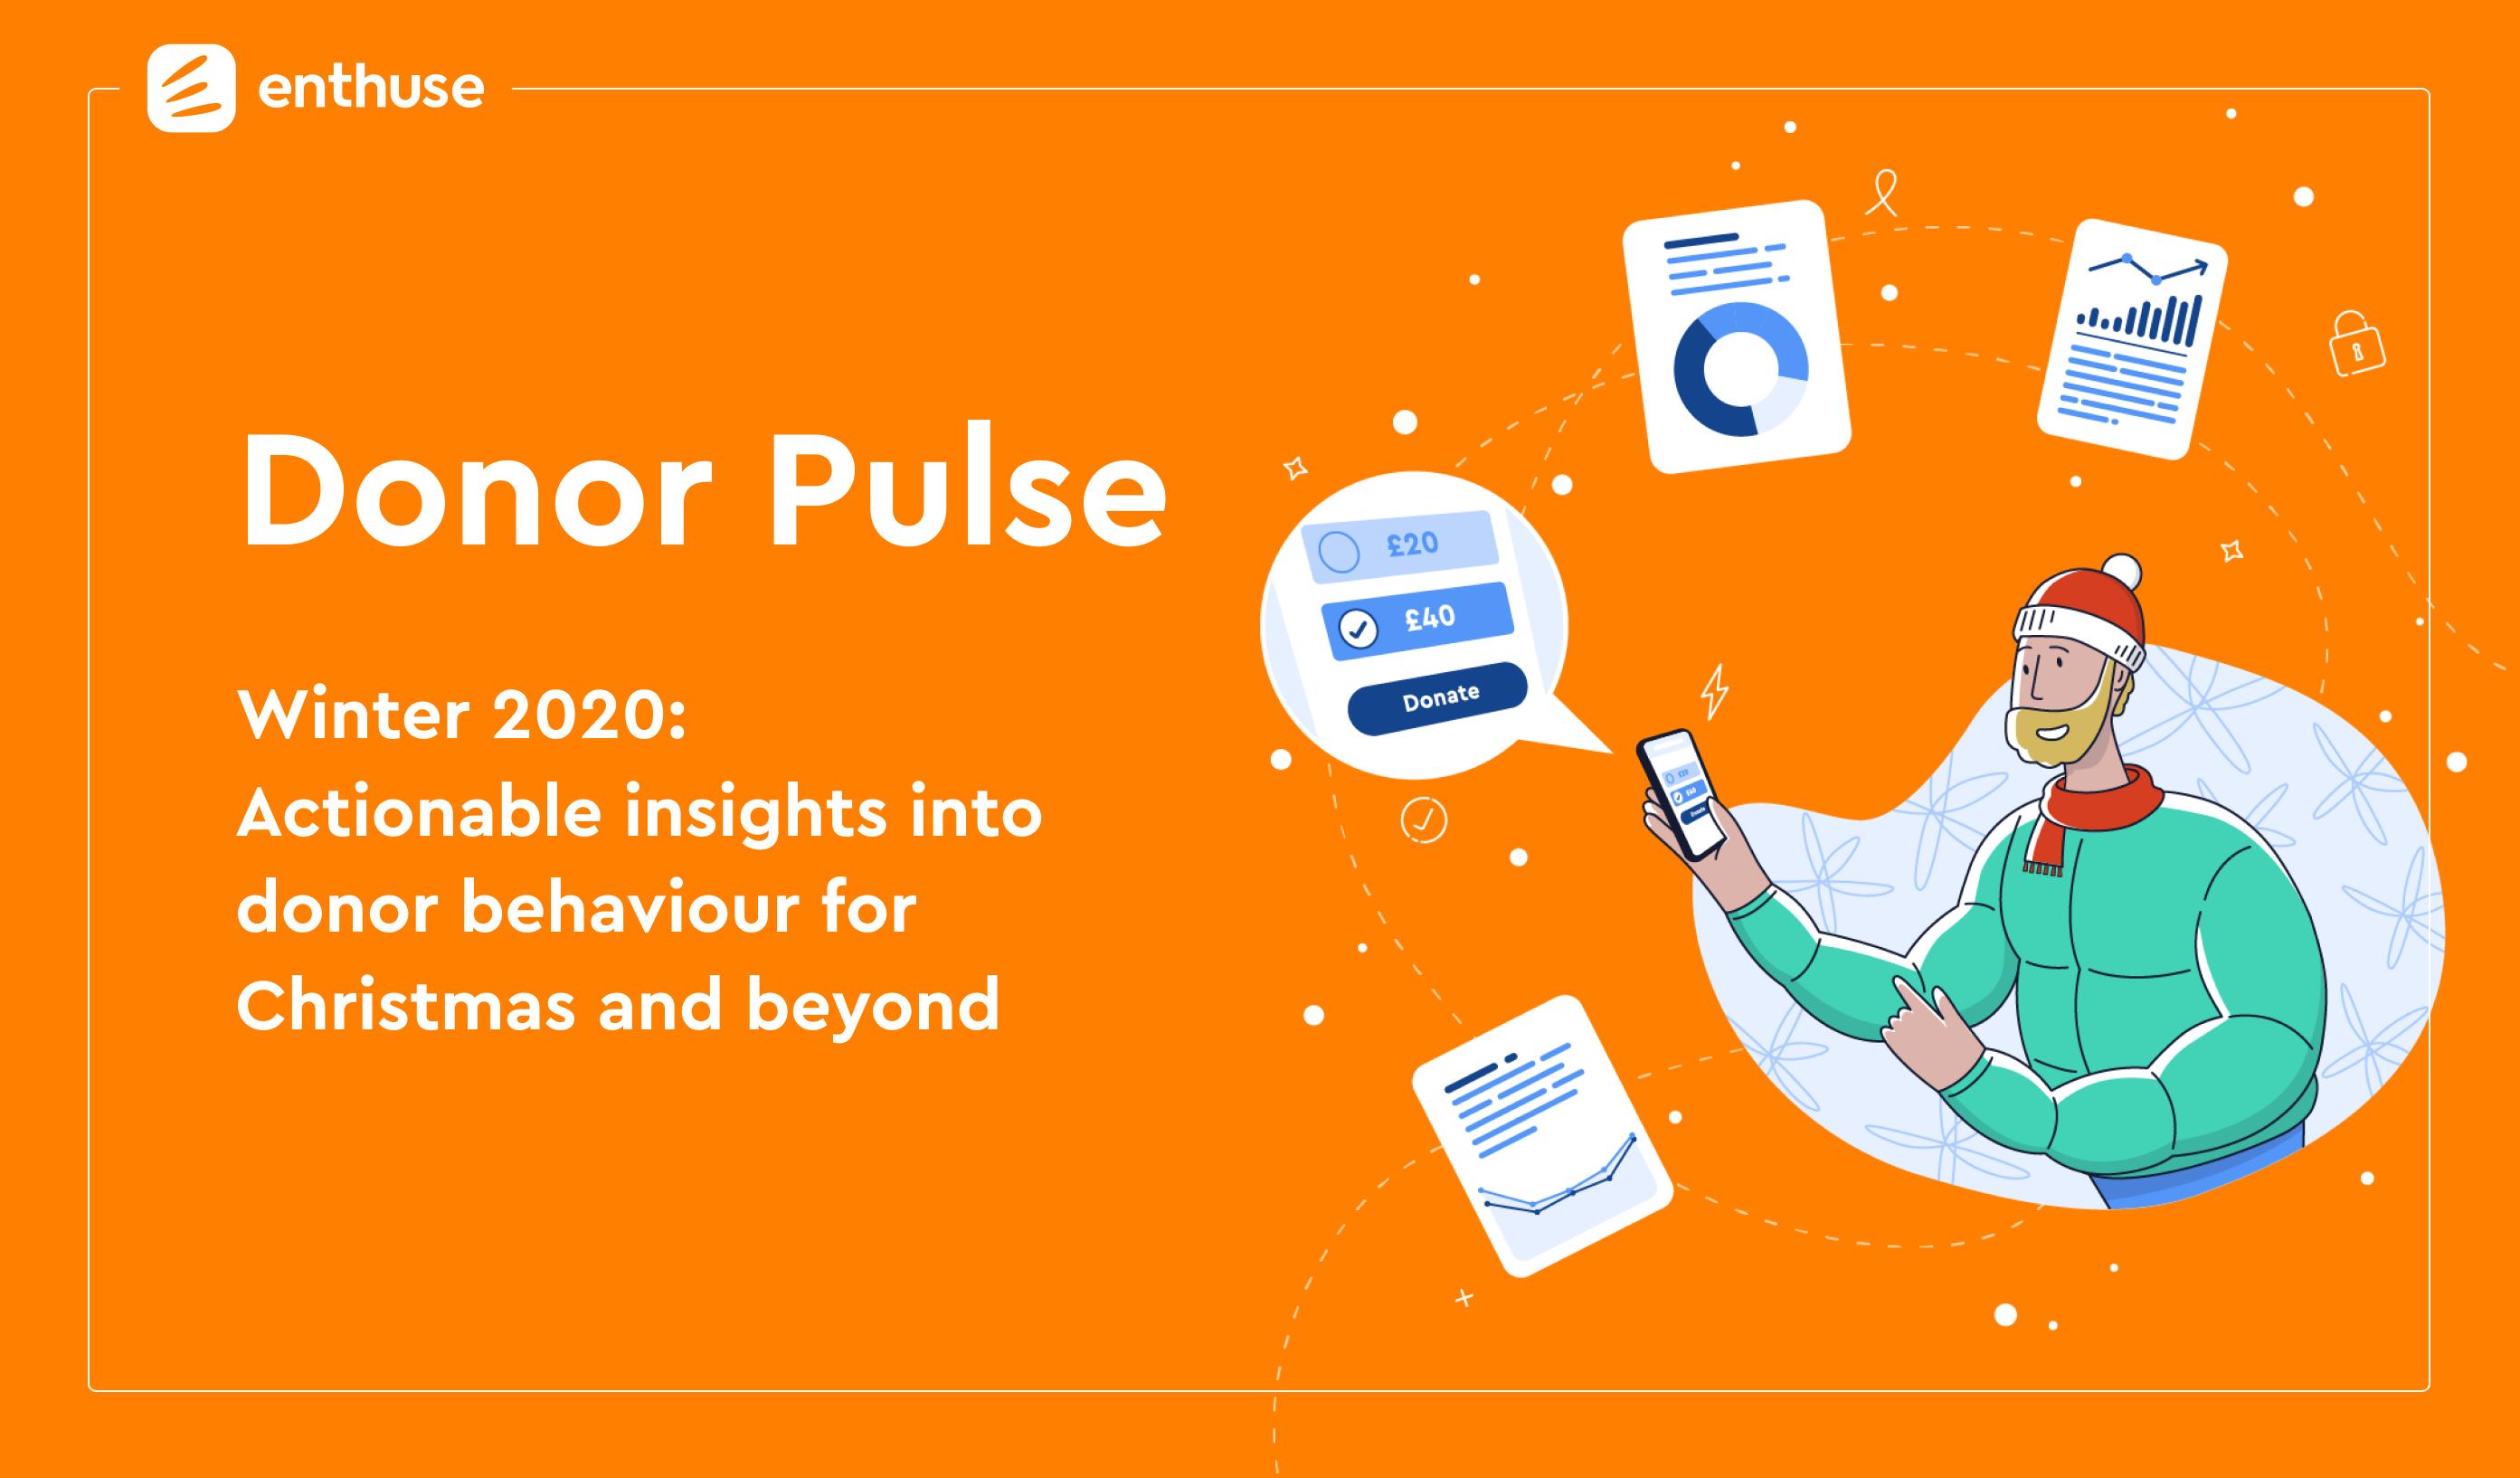 Donor Pulse Report Winter 2020